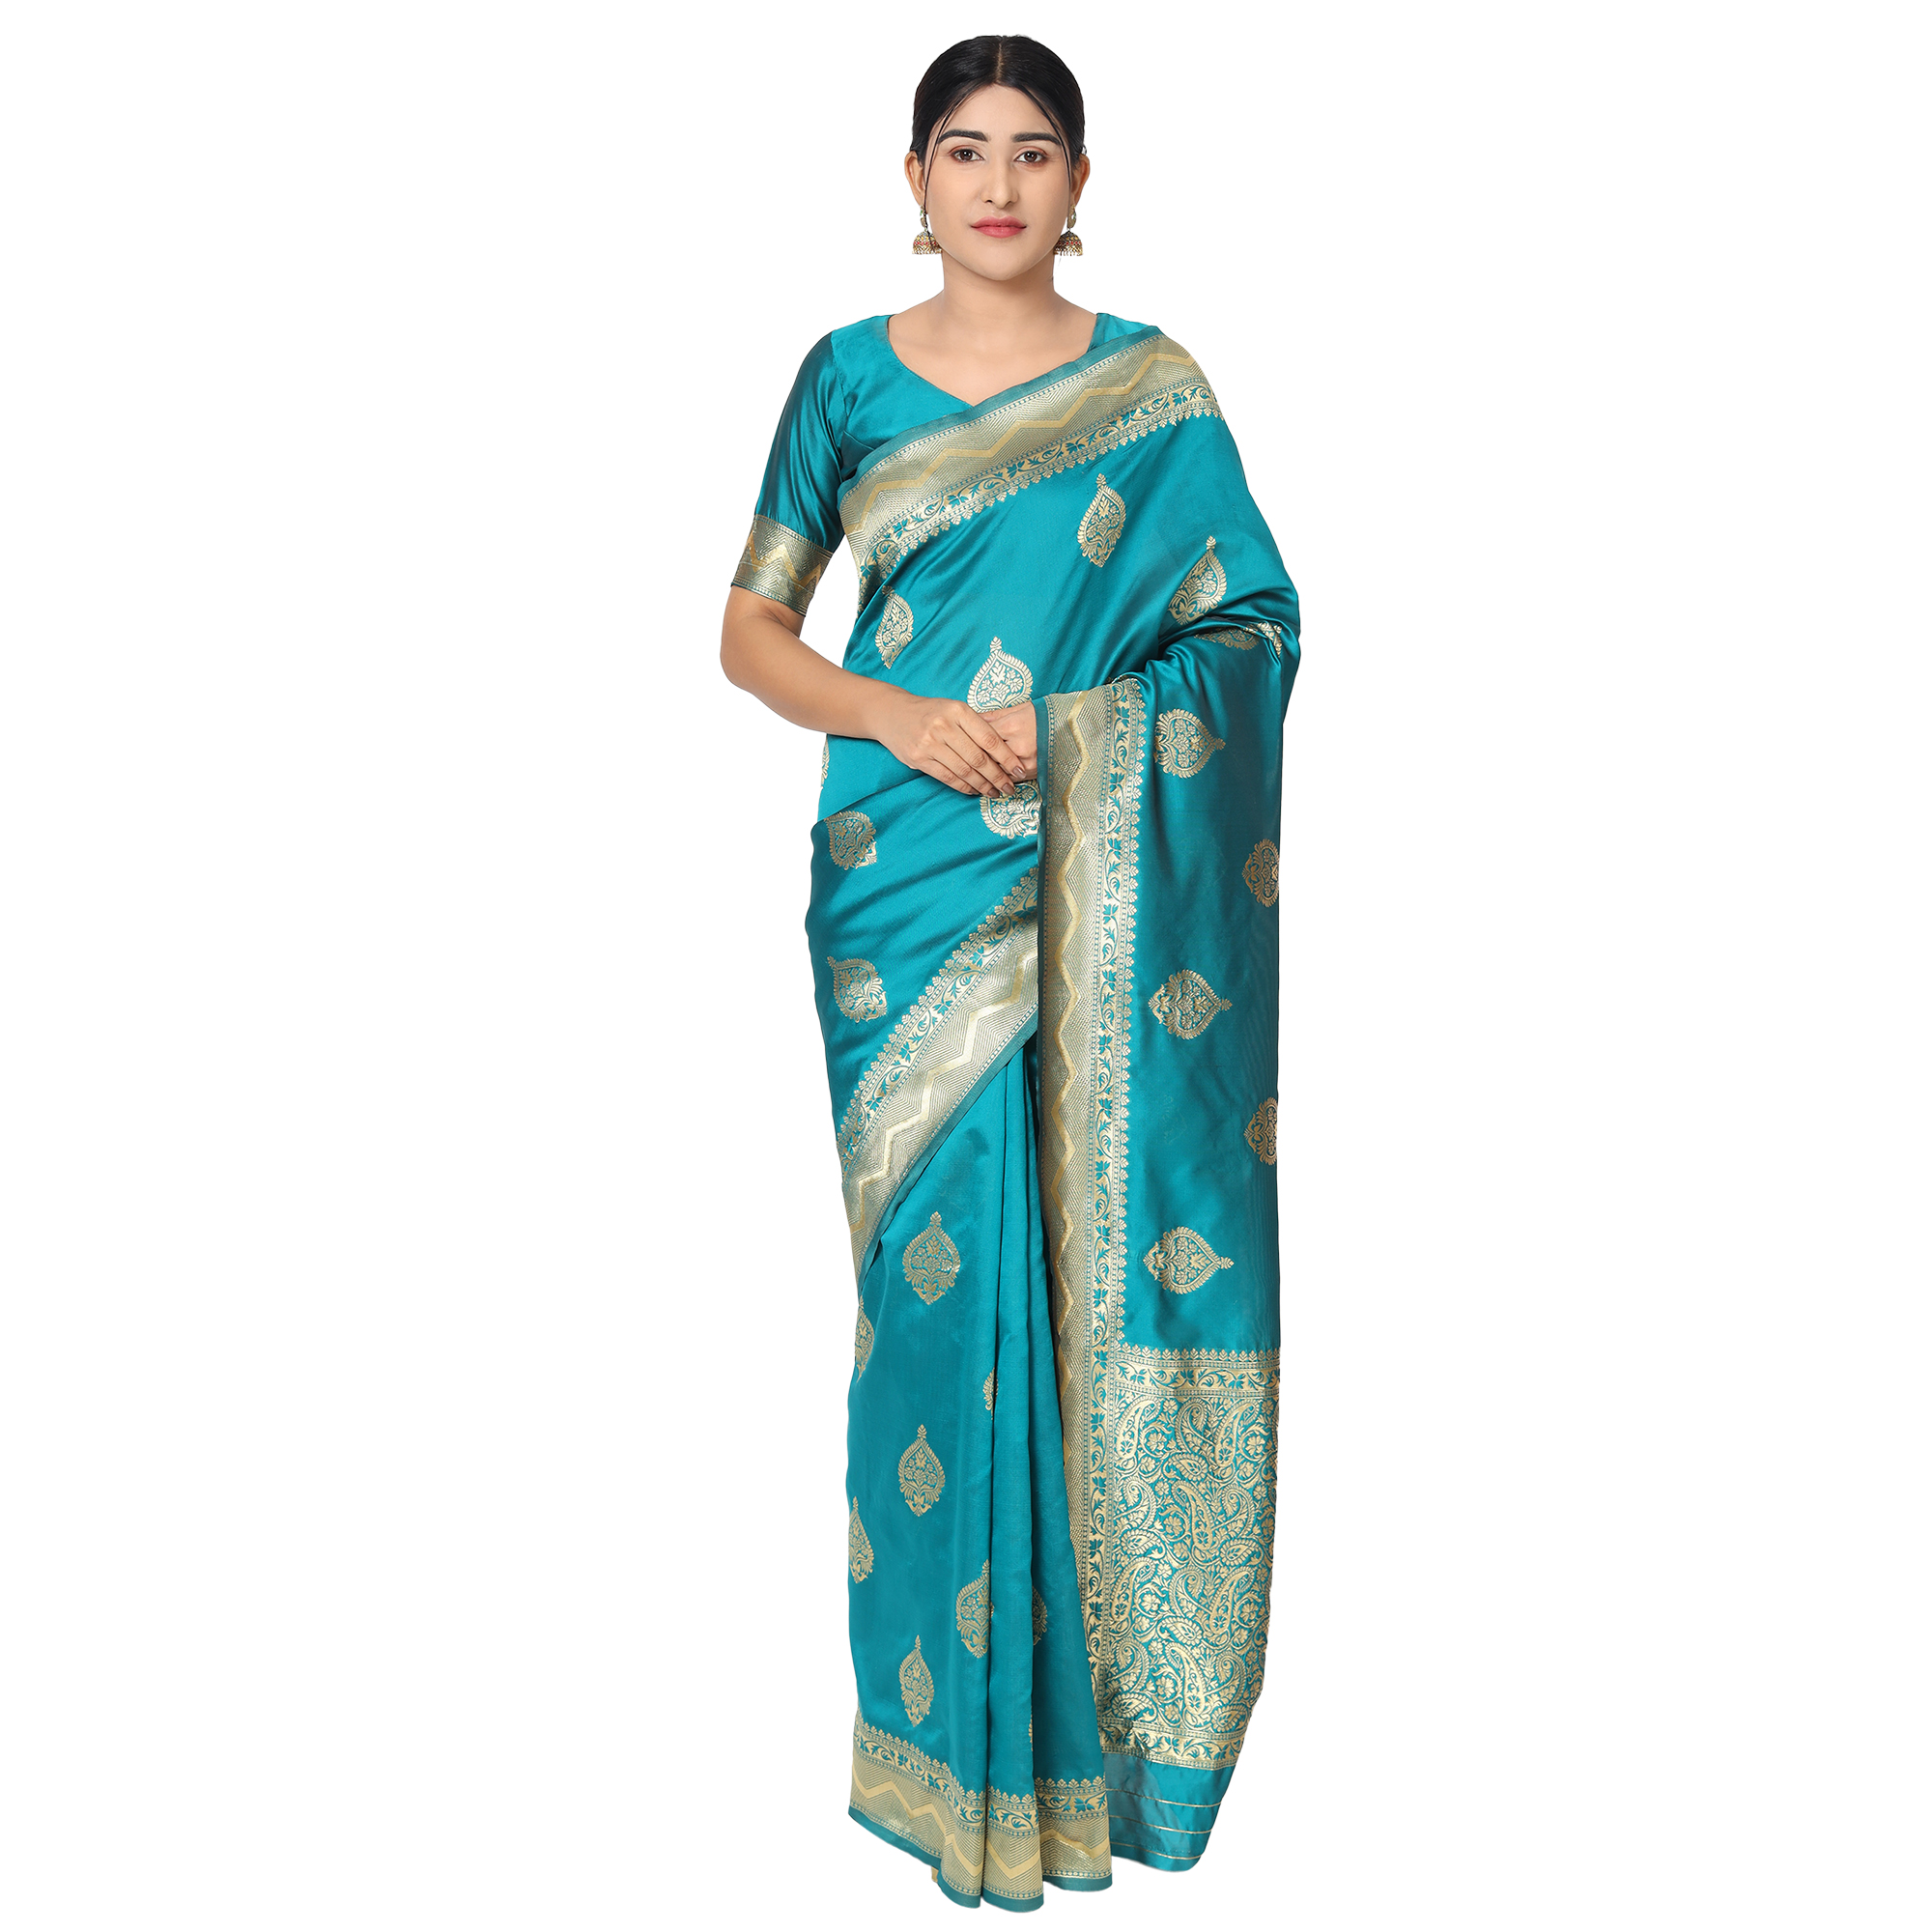 Glemora | Glemora Rama Beautiful Ethnic Wear Silk Blend Banarasi Traditional Saree